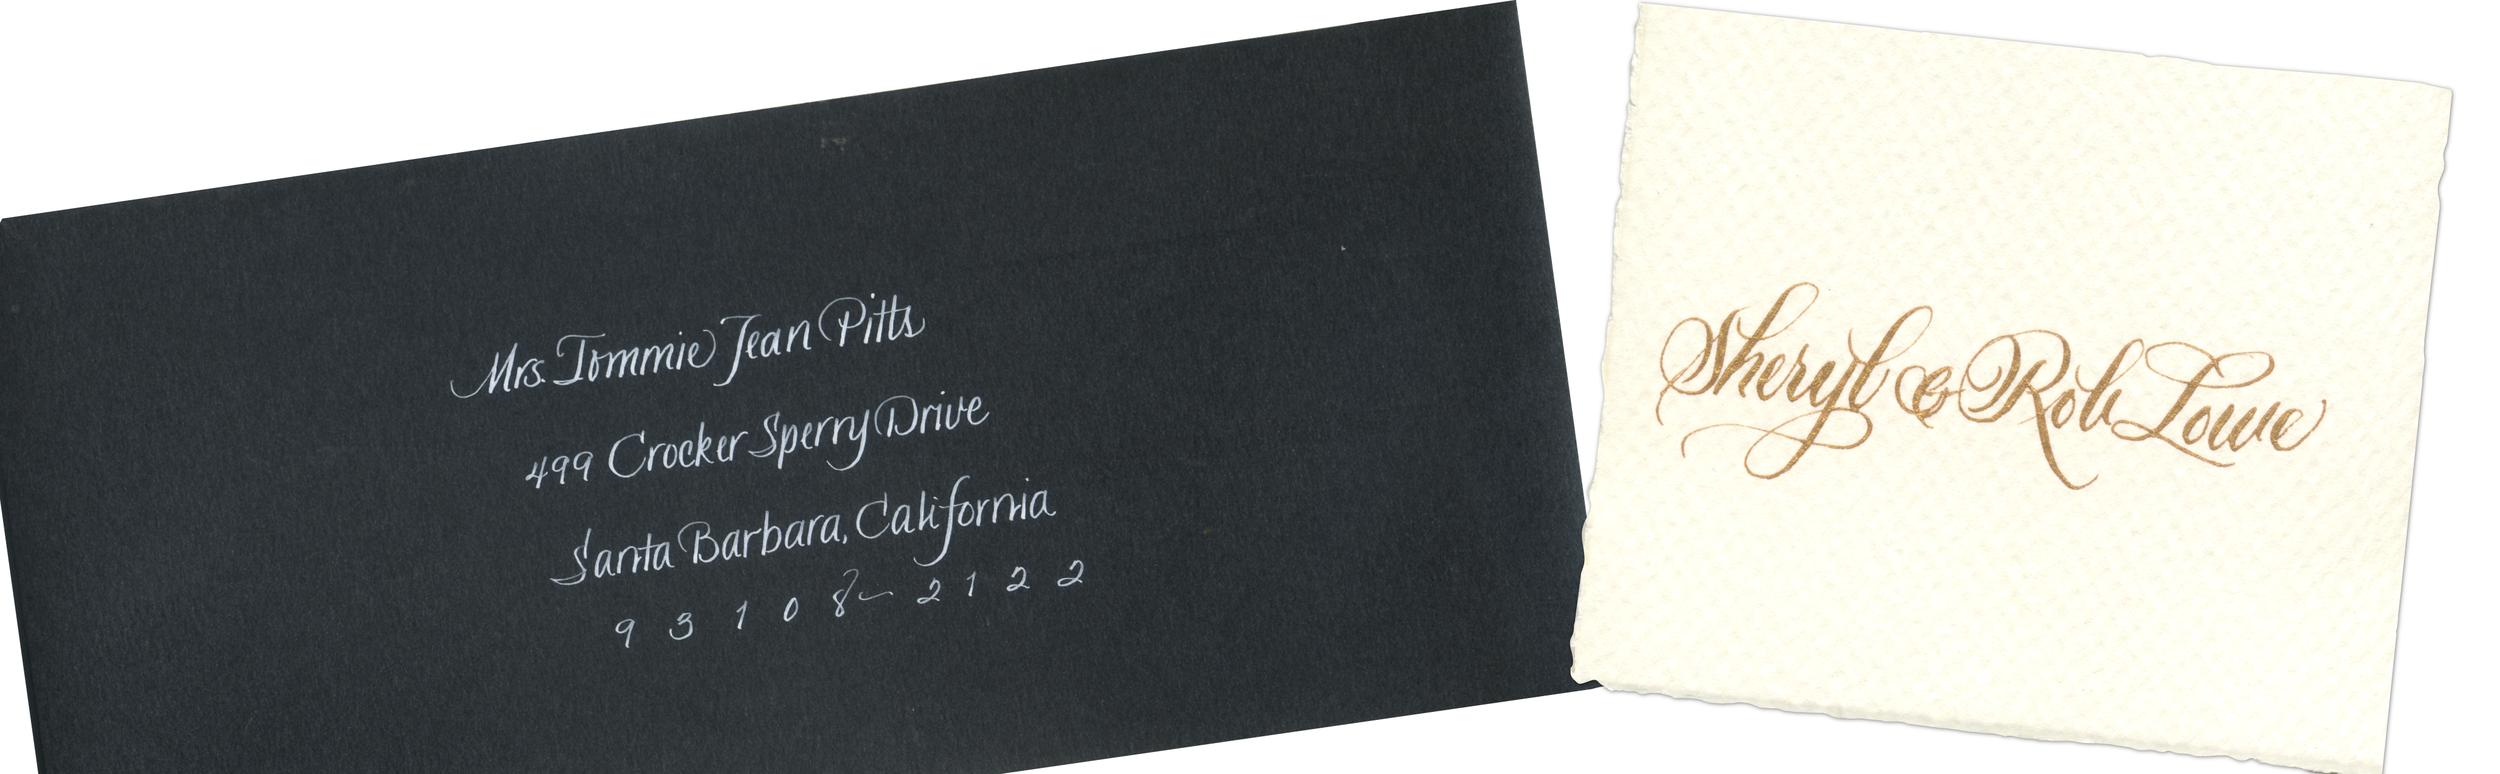 calligraphy-slider-3.png